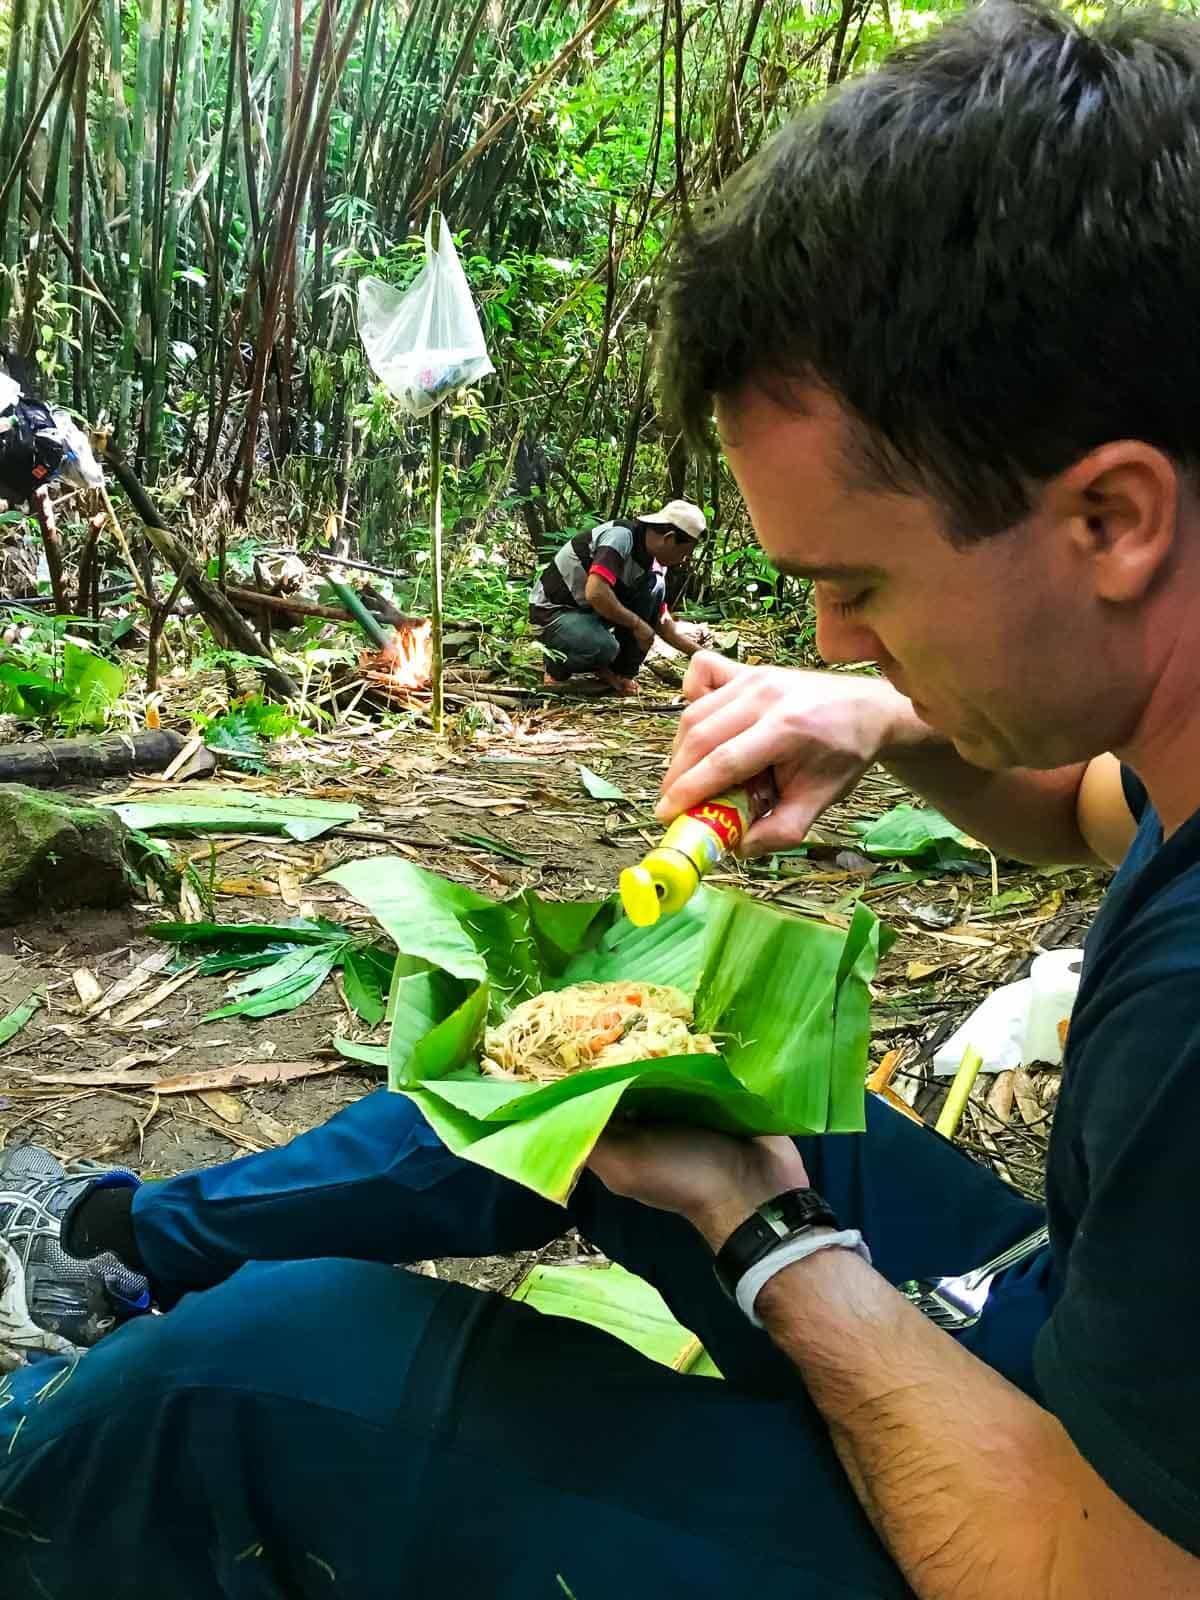 Northern Thailand hiking - Banana leaf noodle lunch